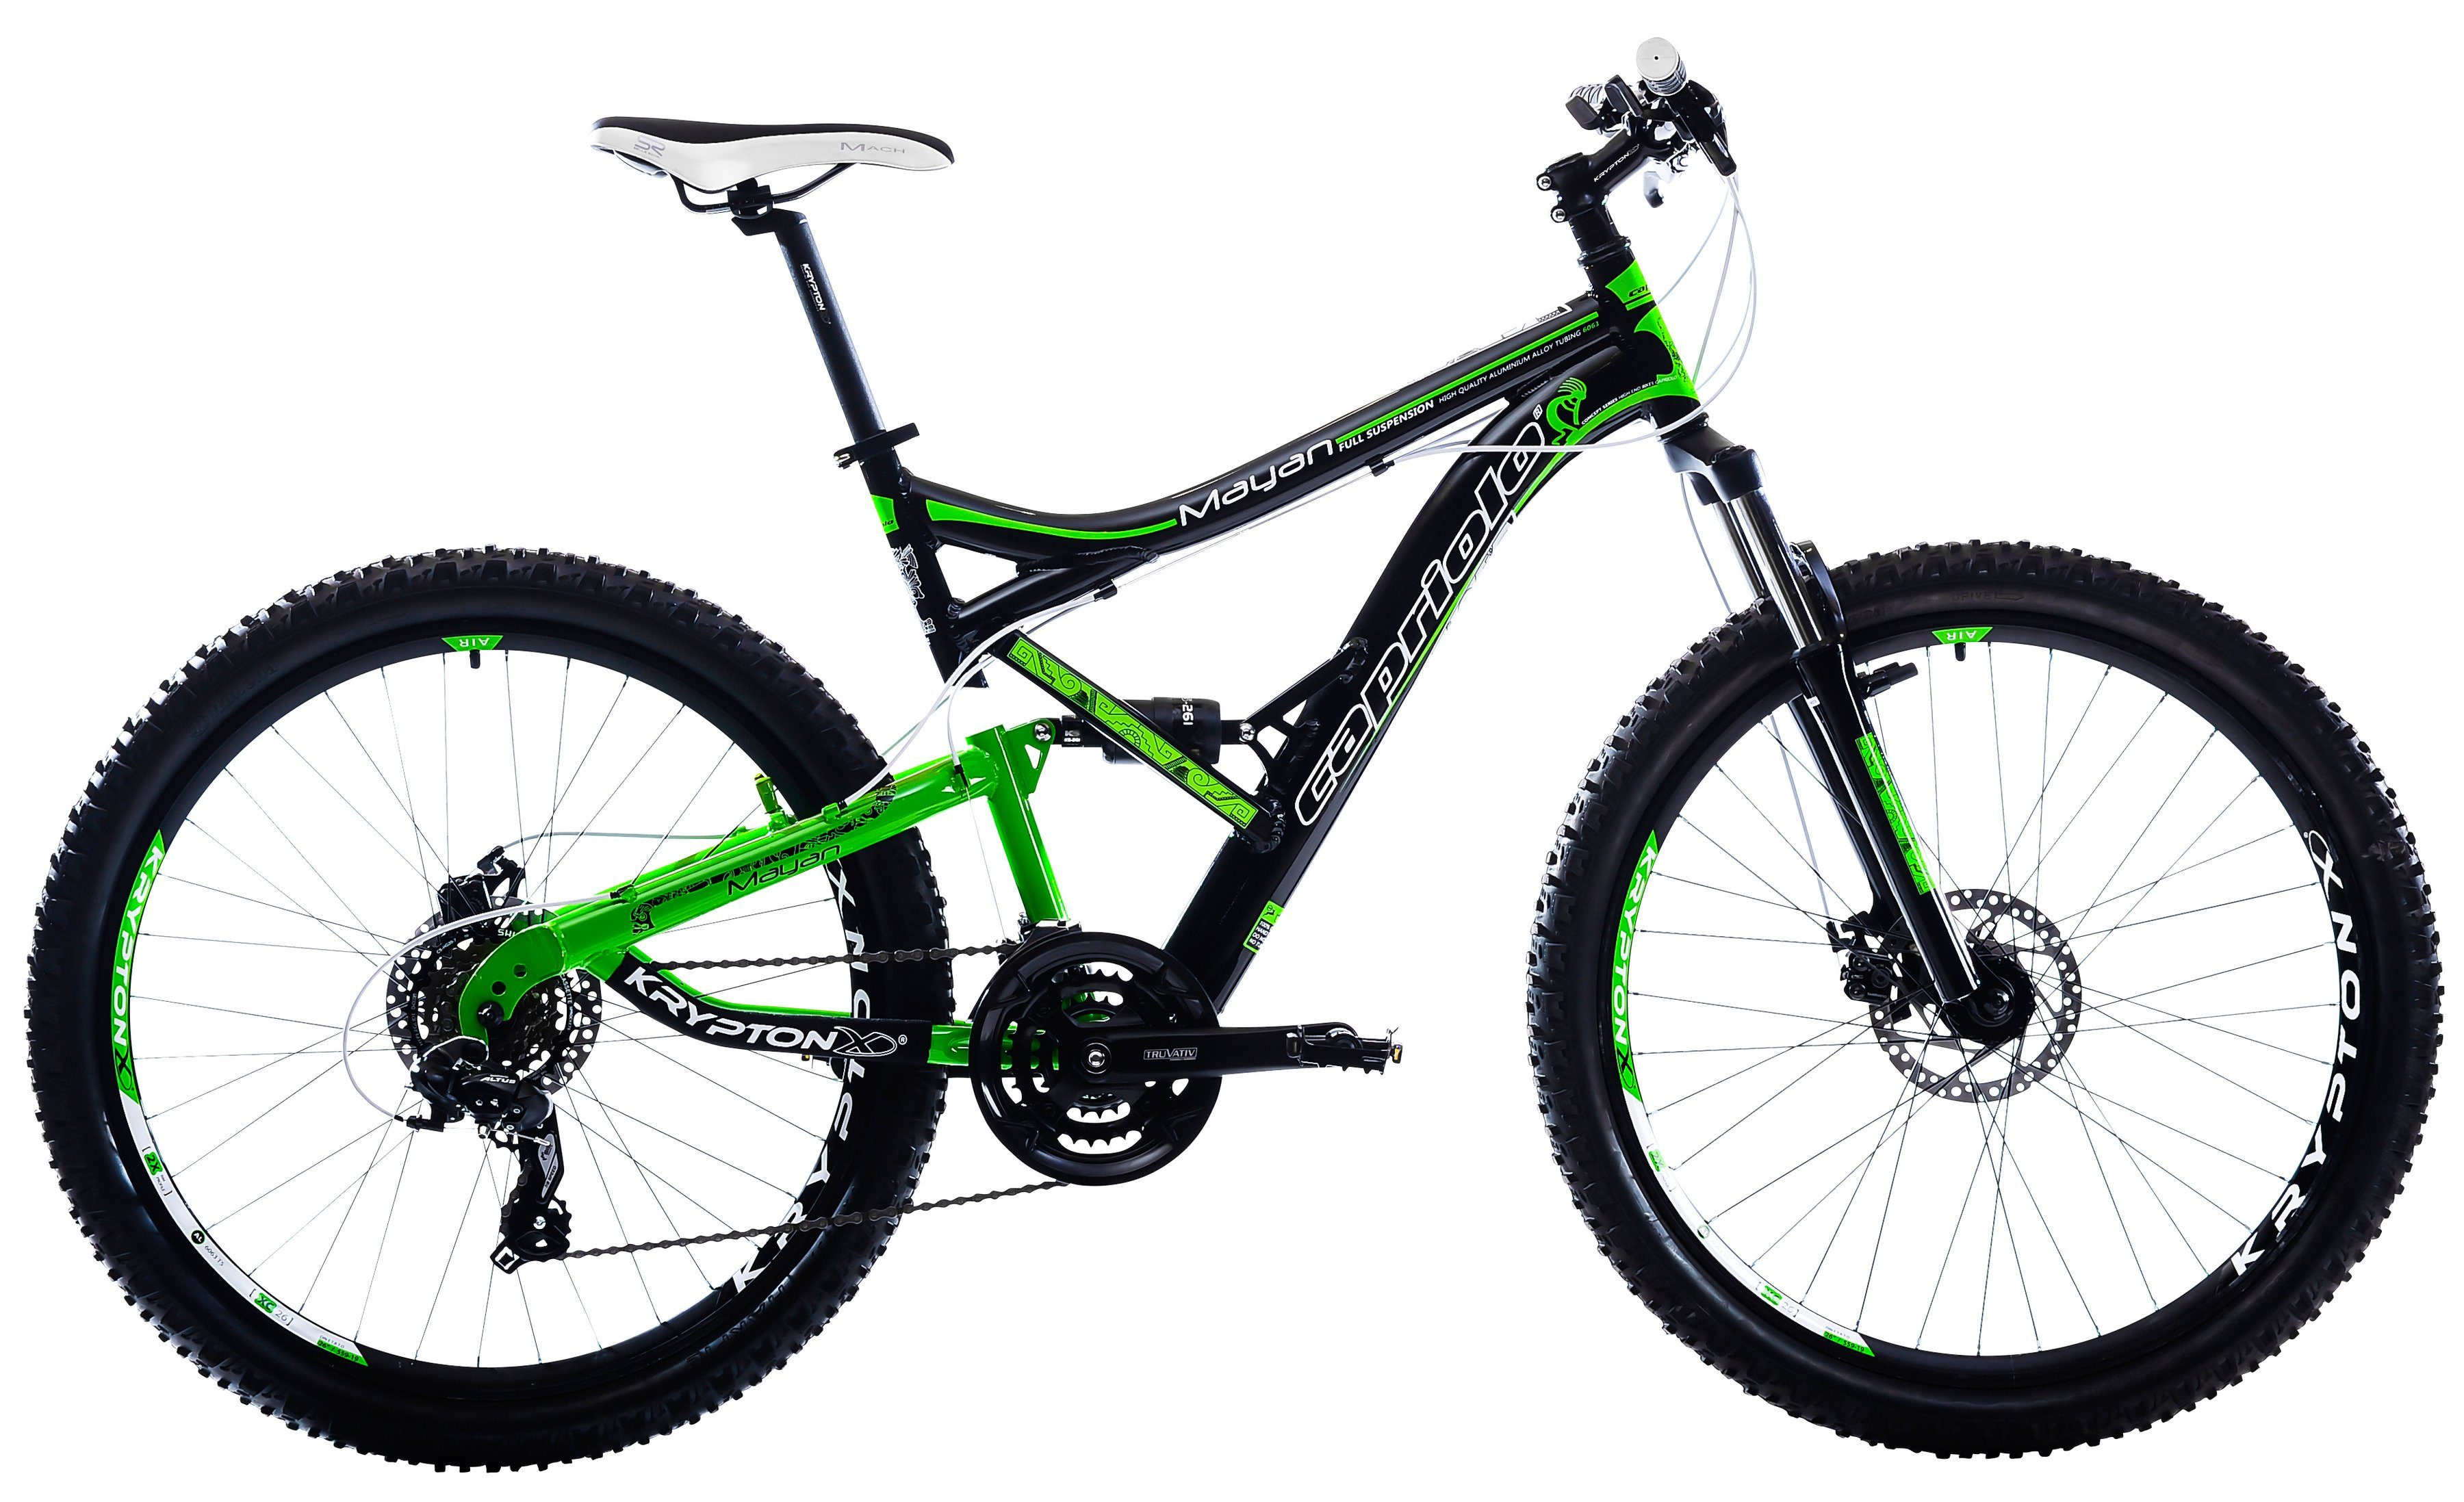 Capriolo Mountainbike »Mayan, 66,04 cm (26 Zoll)«